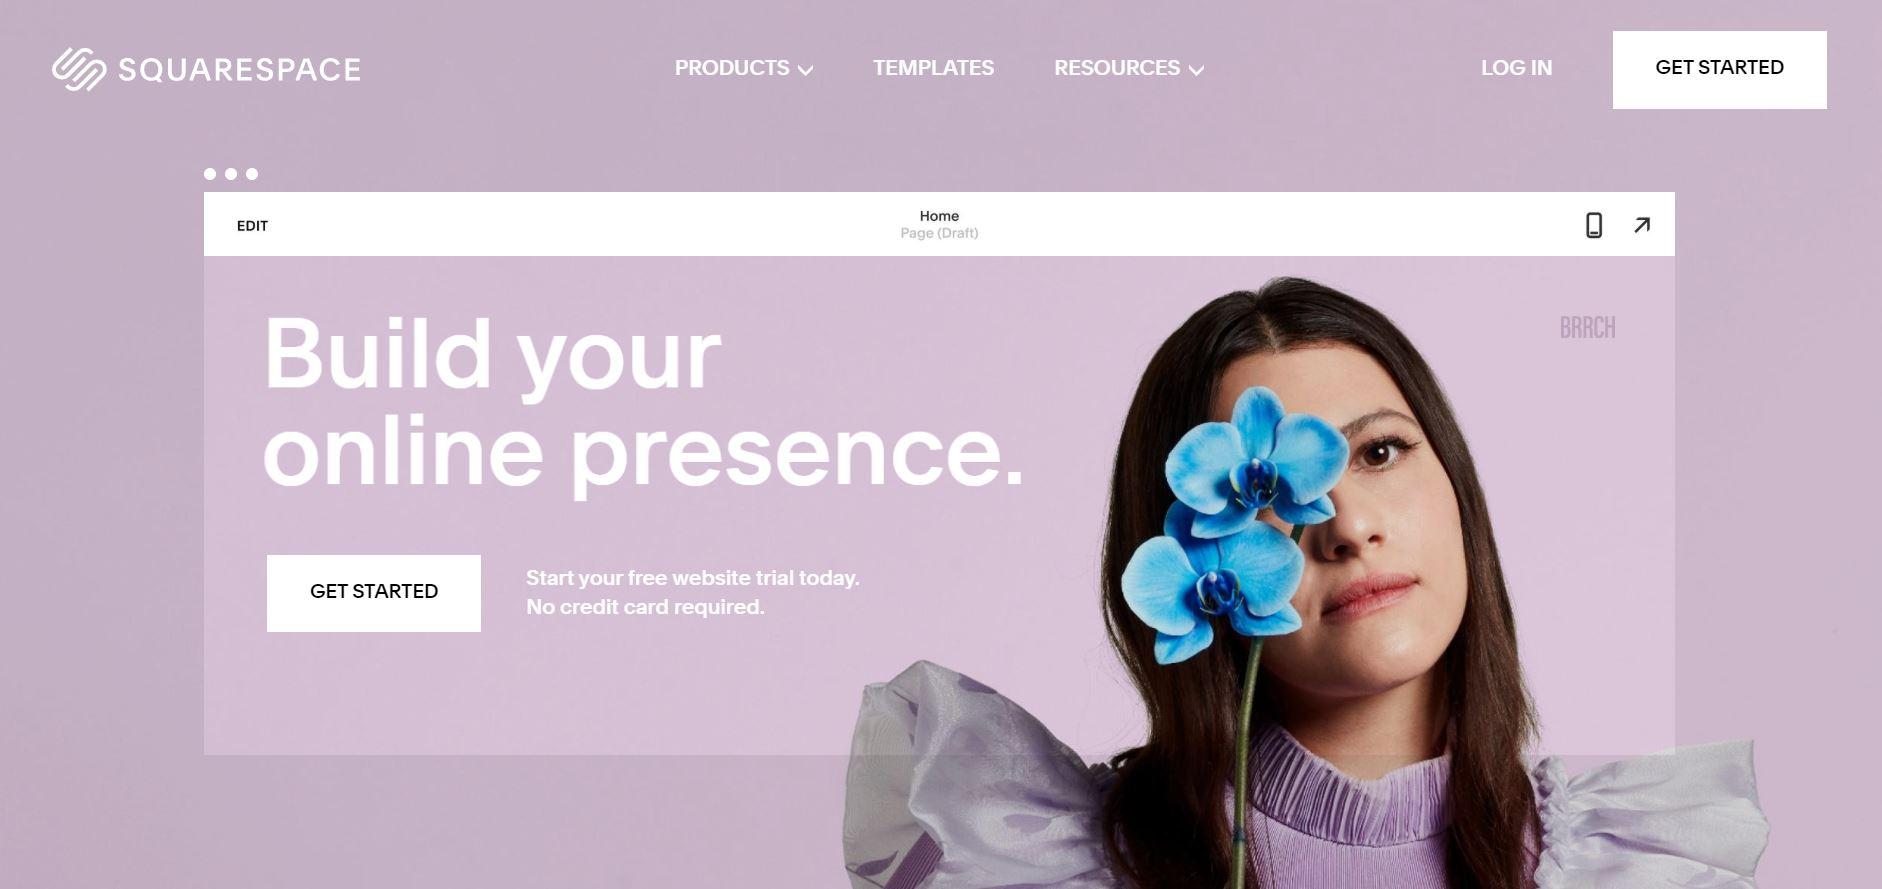 Squarespace网站构建器。